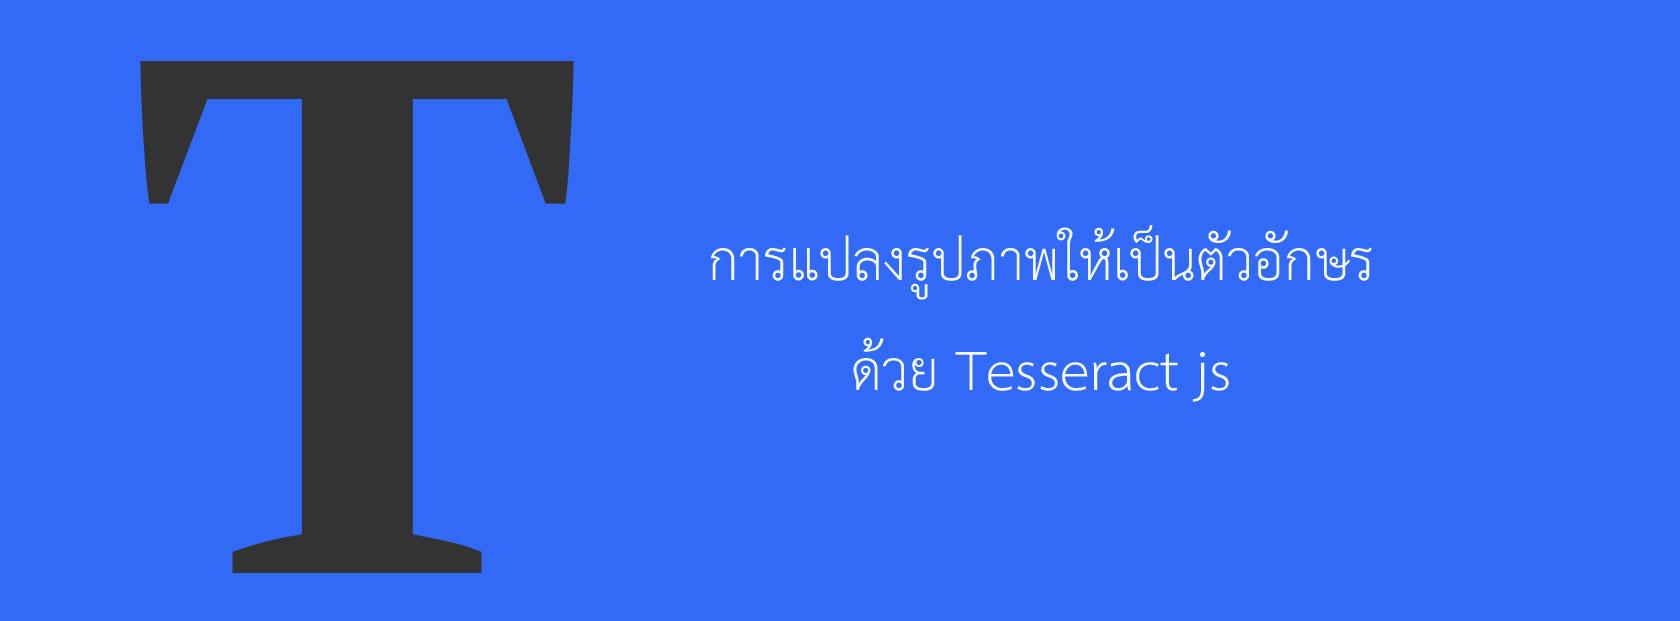 txtocr